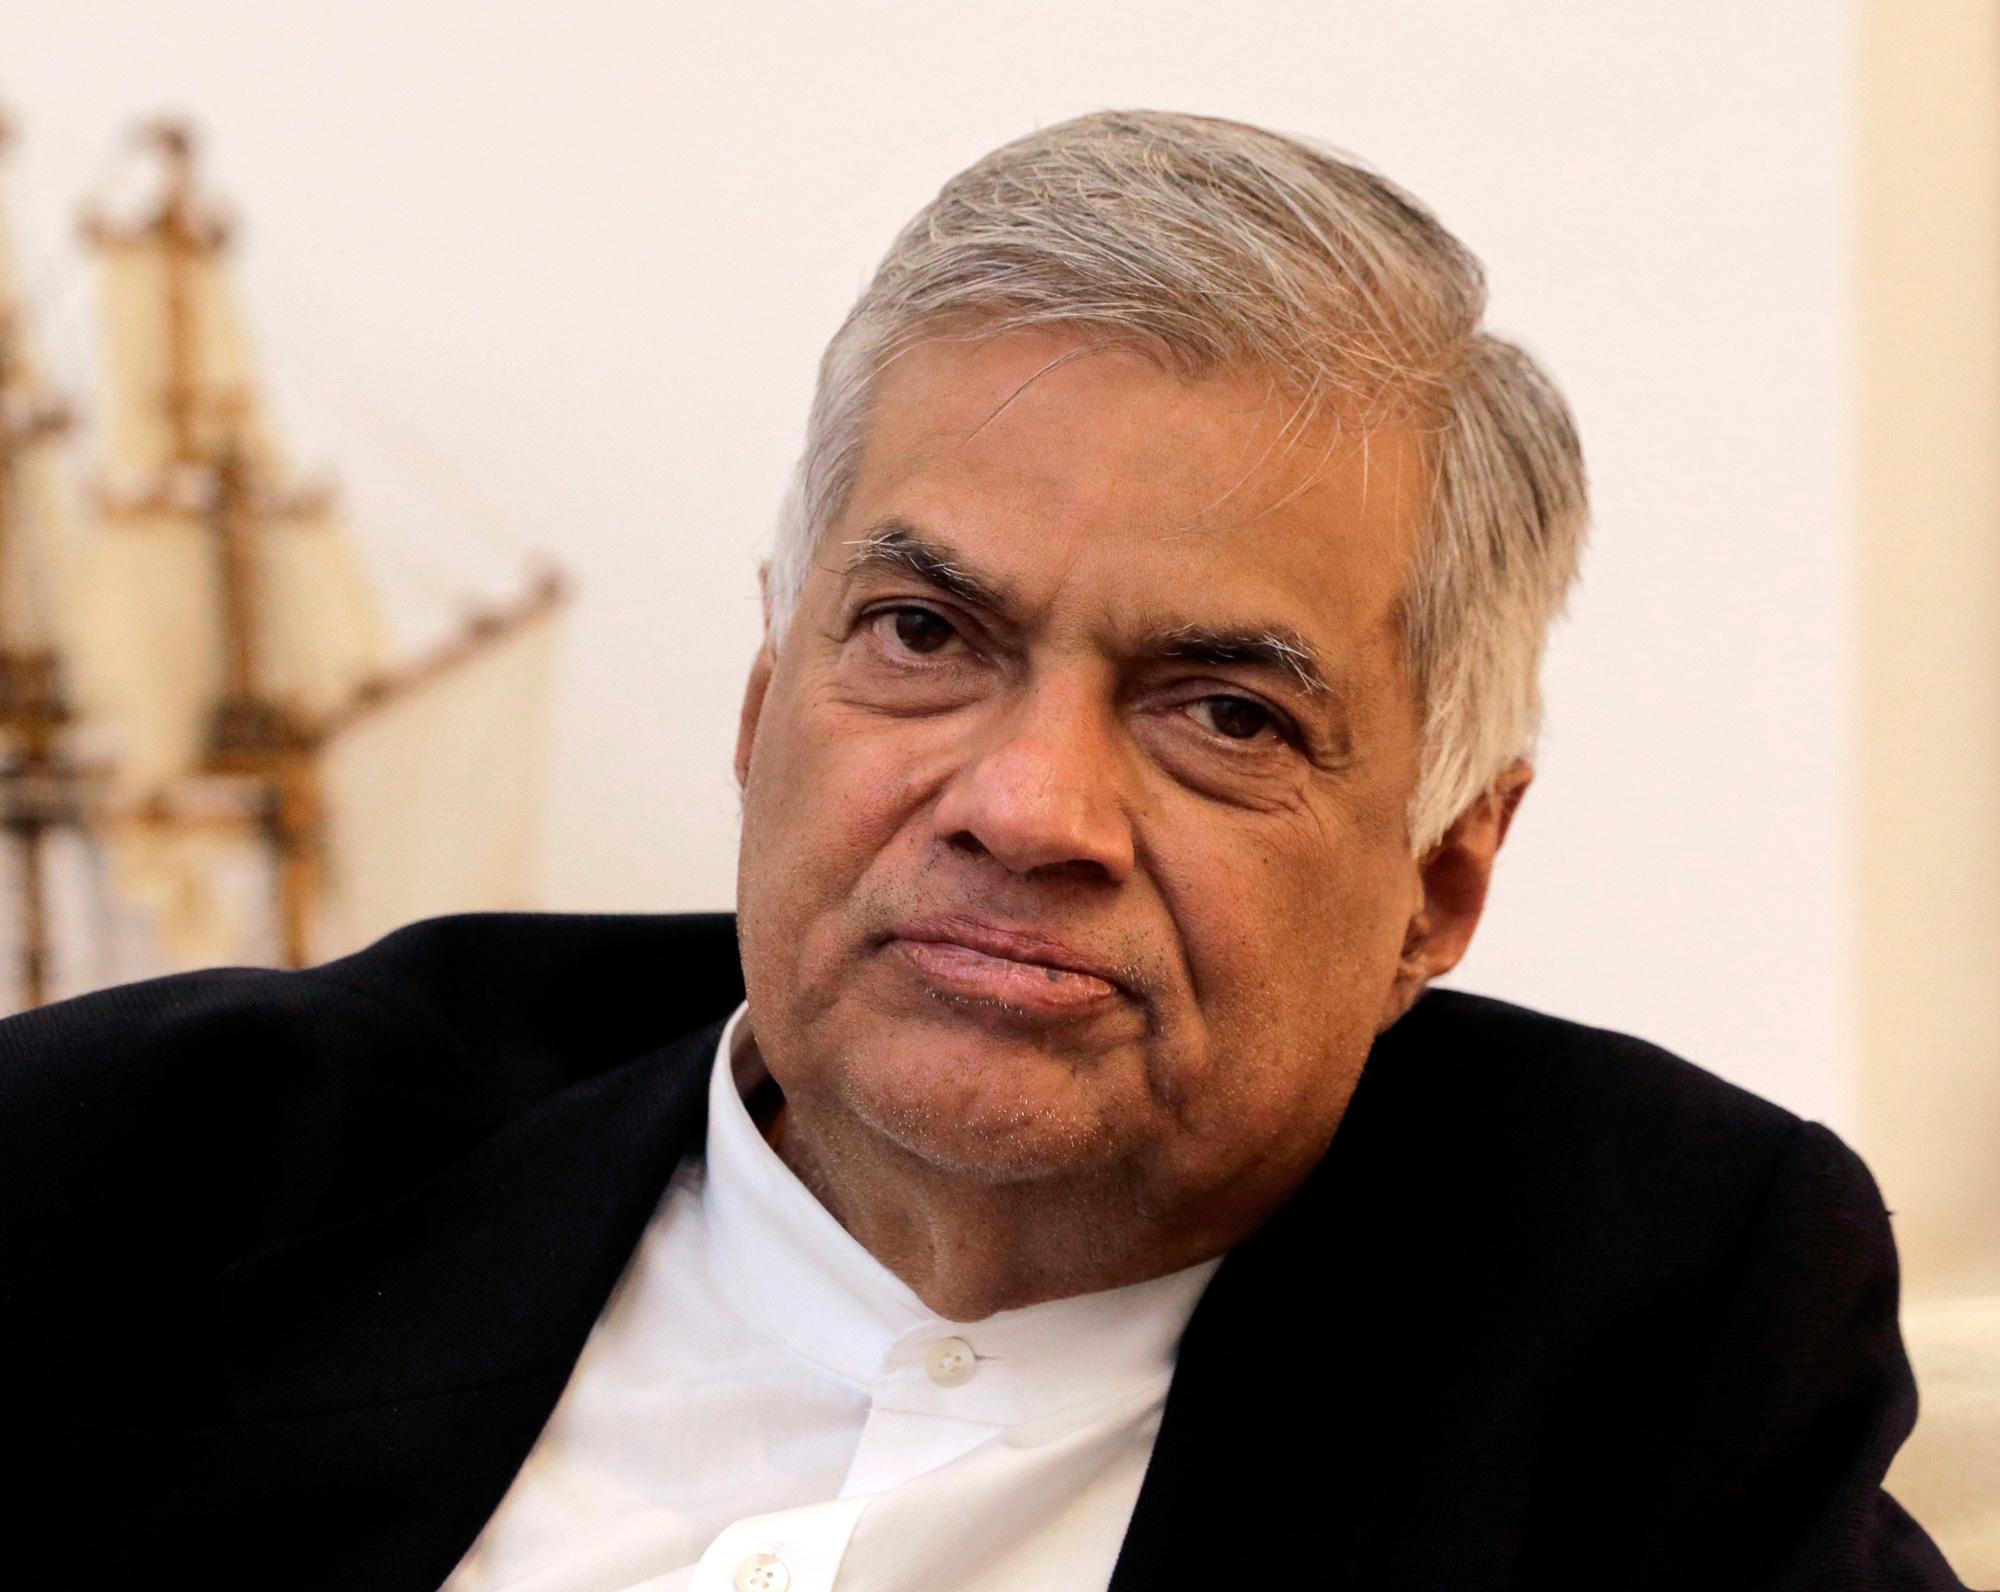 File picture of Ranil Wickremesinghe in Colombo, Sri Lanka, dated November 2, 2018